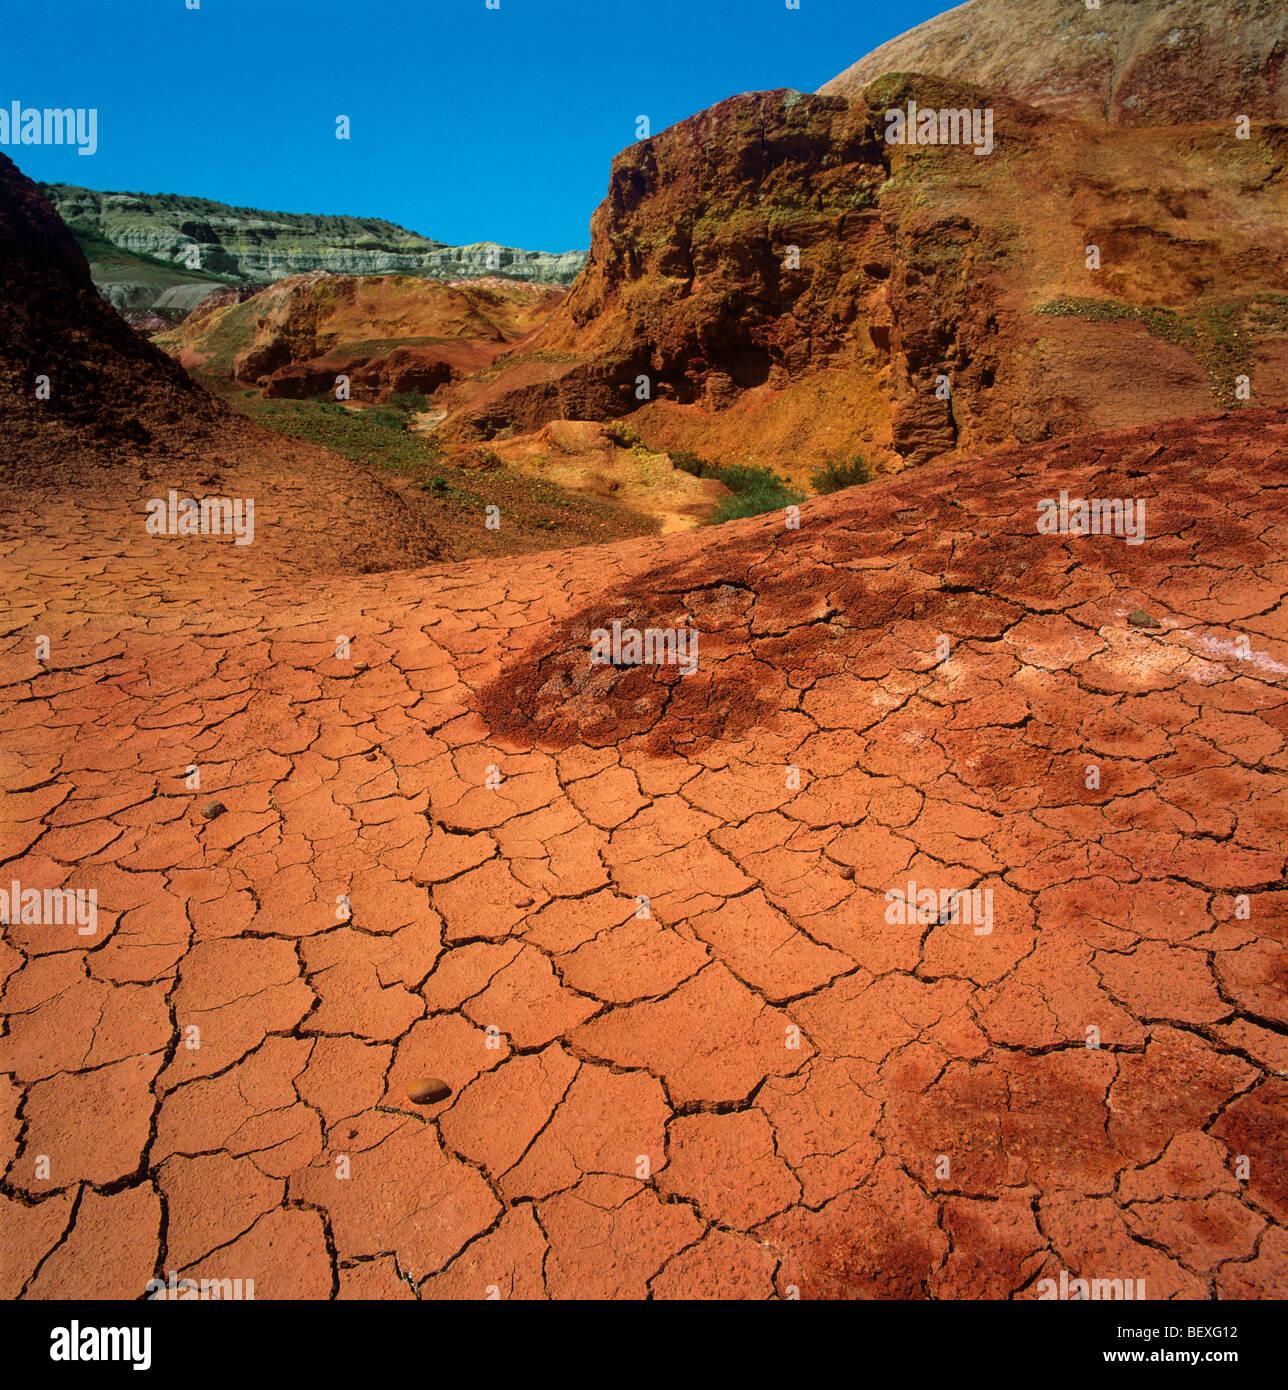 Las arcillas rojas del sitio paleontológico Kiin-Kerish. Zaisan Depresión, Kazajstán oriental Imagen De Stock